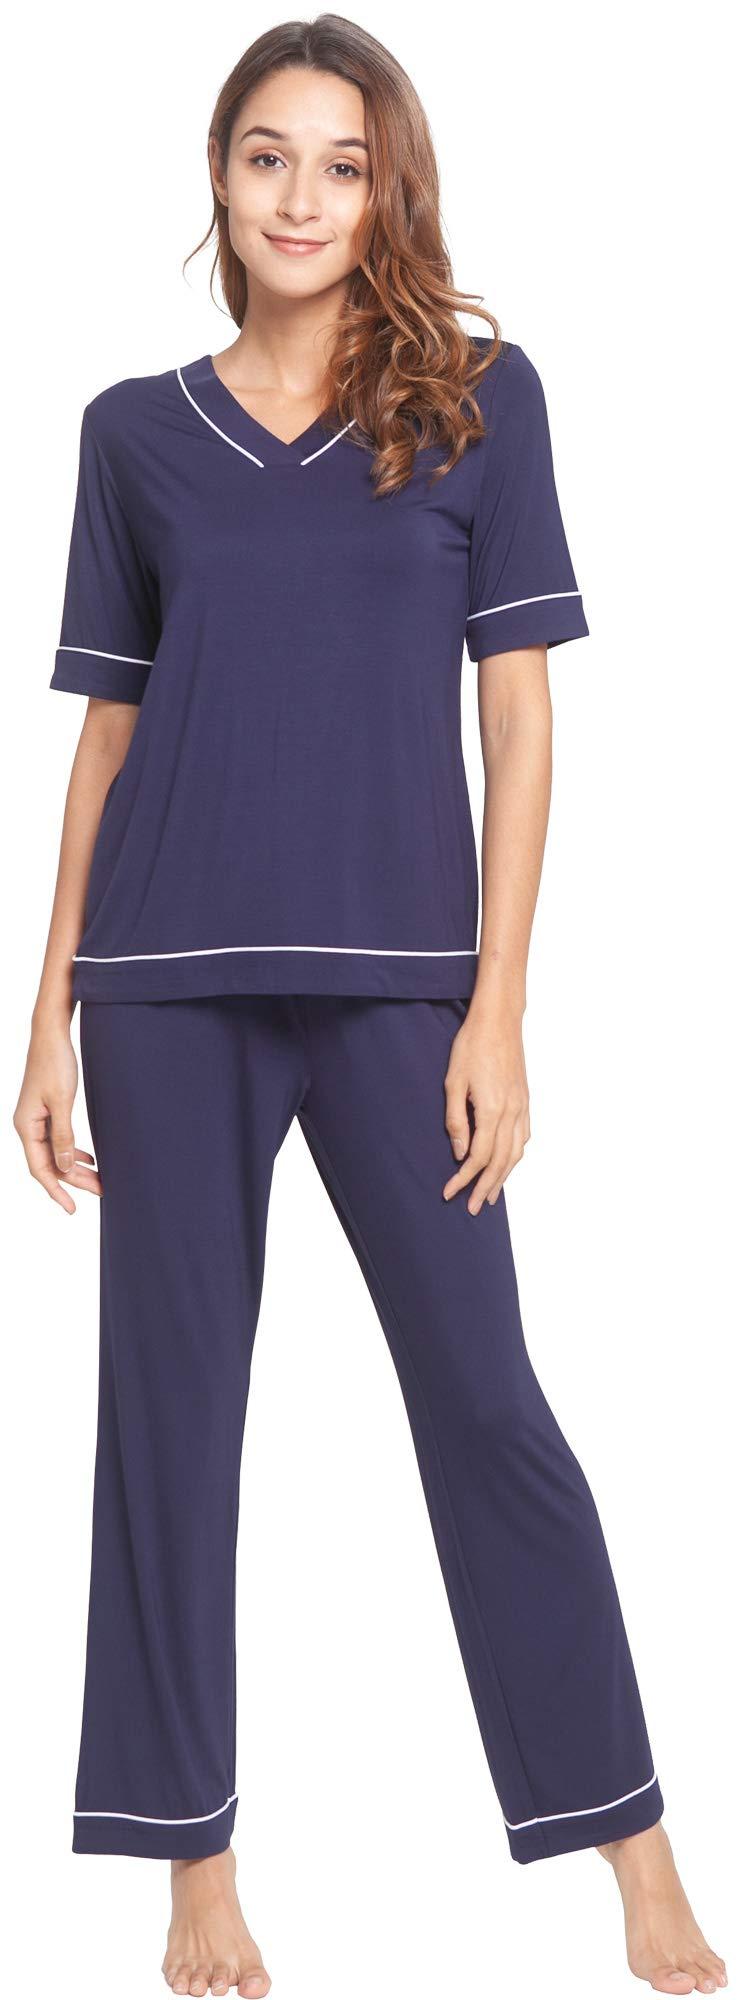 WiWi Women Short Sleeve Pants Pajamas Set S-4X